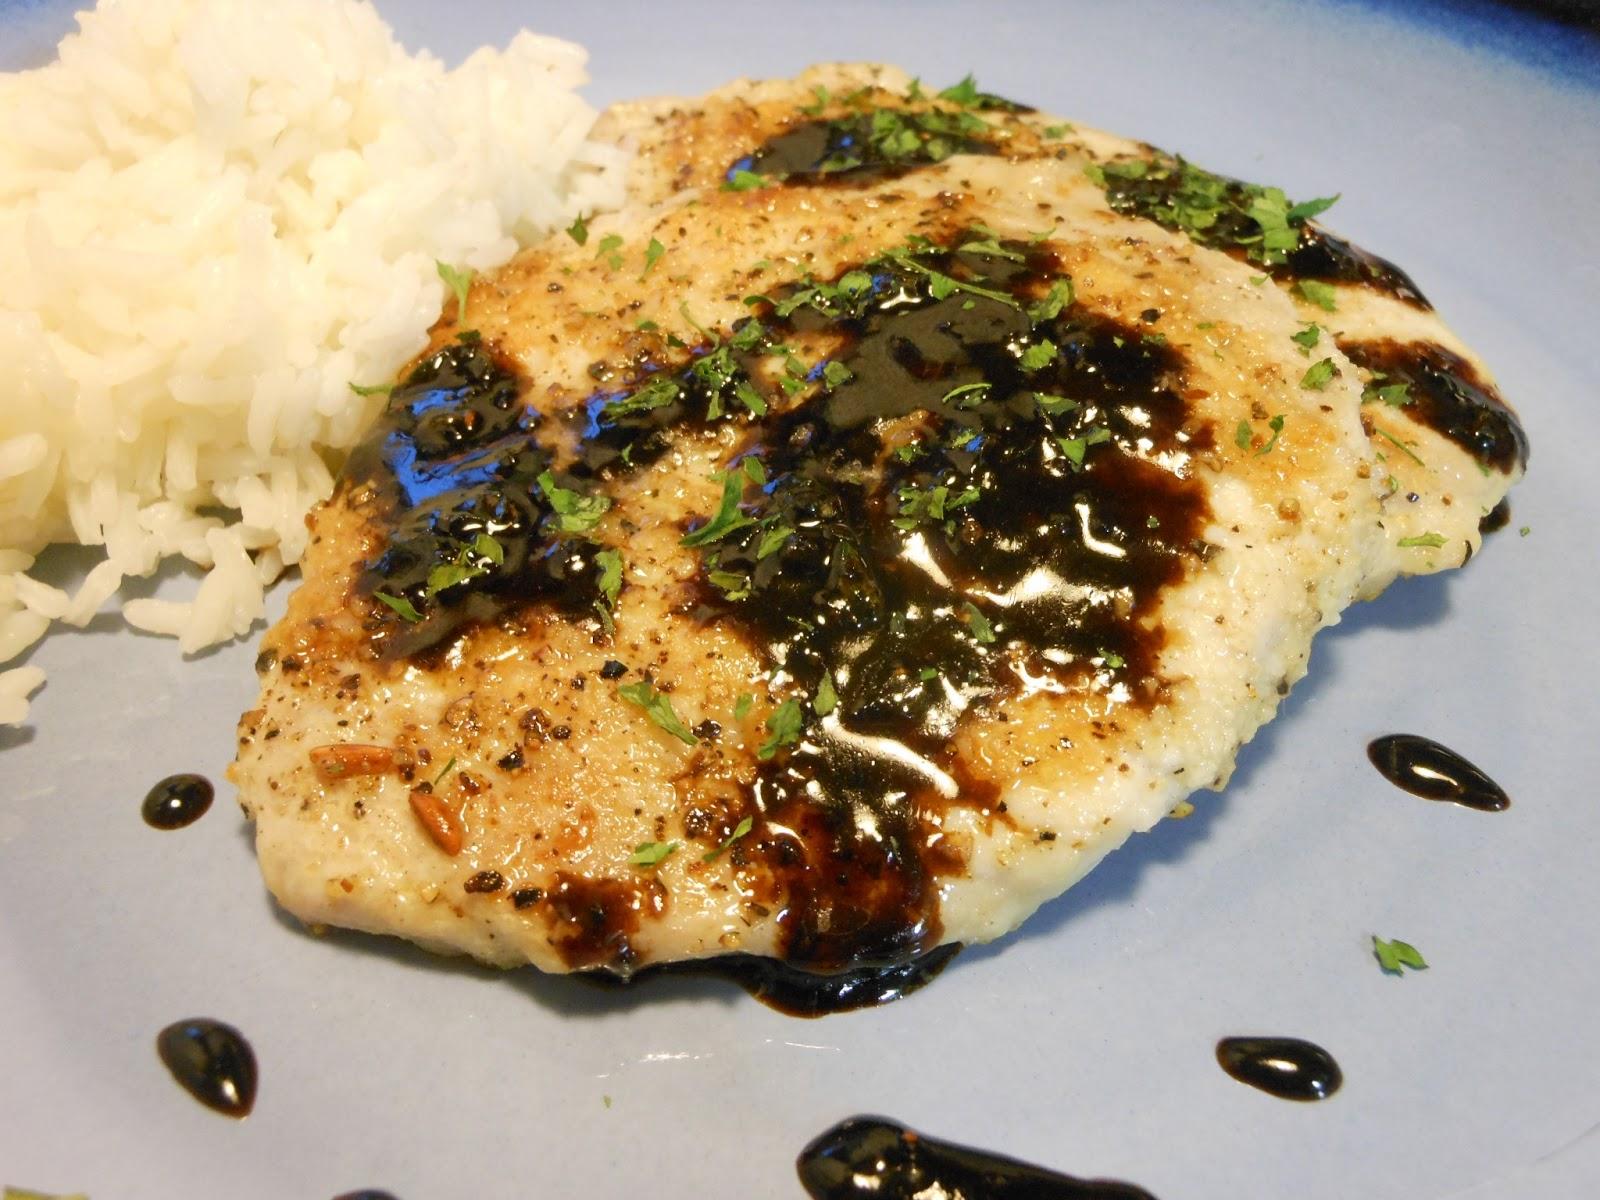 My Chicago Kitchen: Balsamic-Glazed Pork Chops